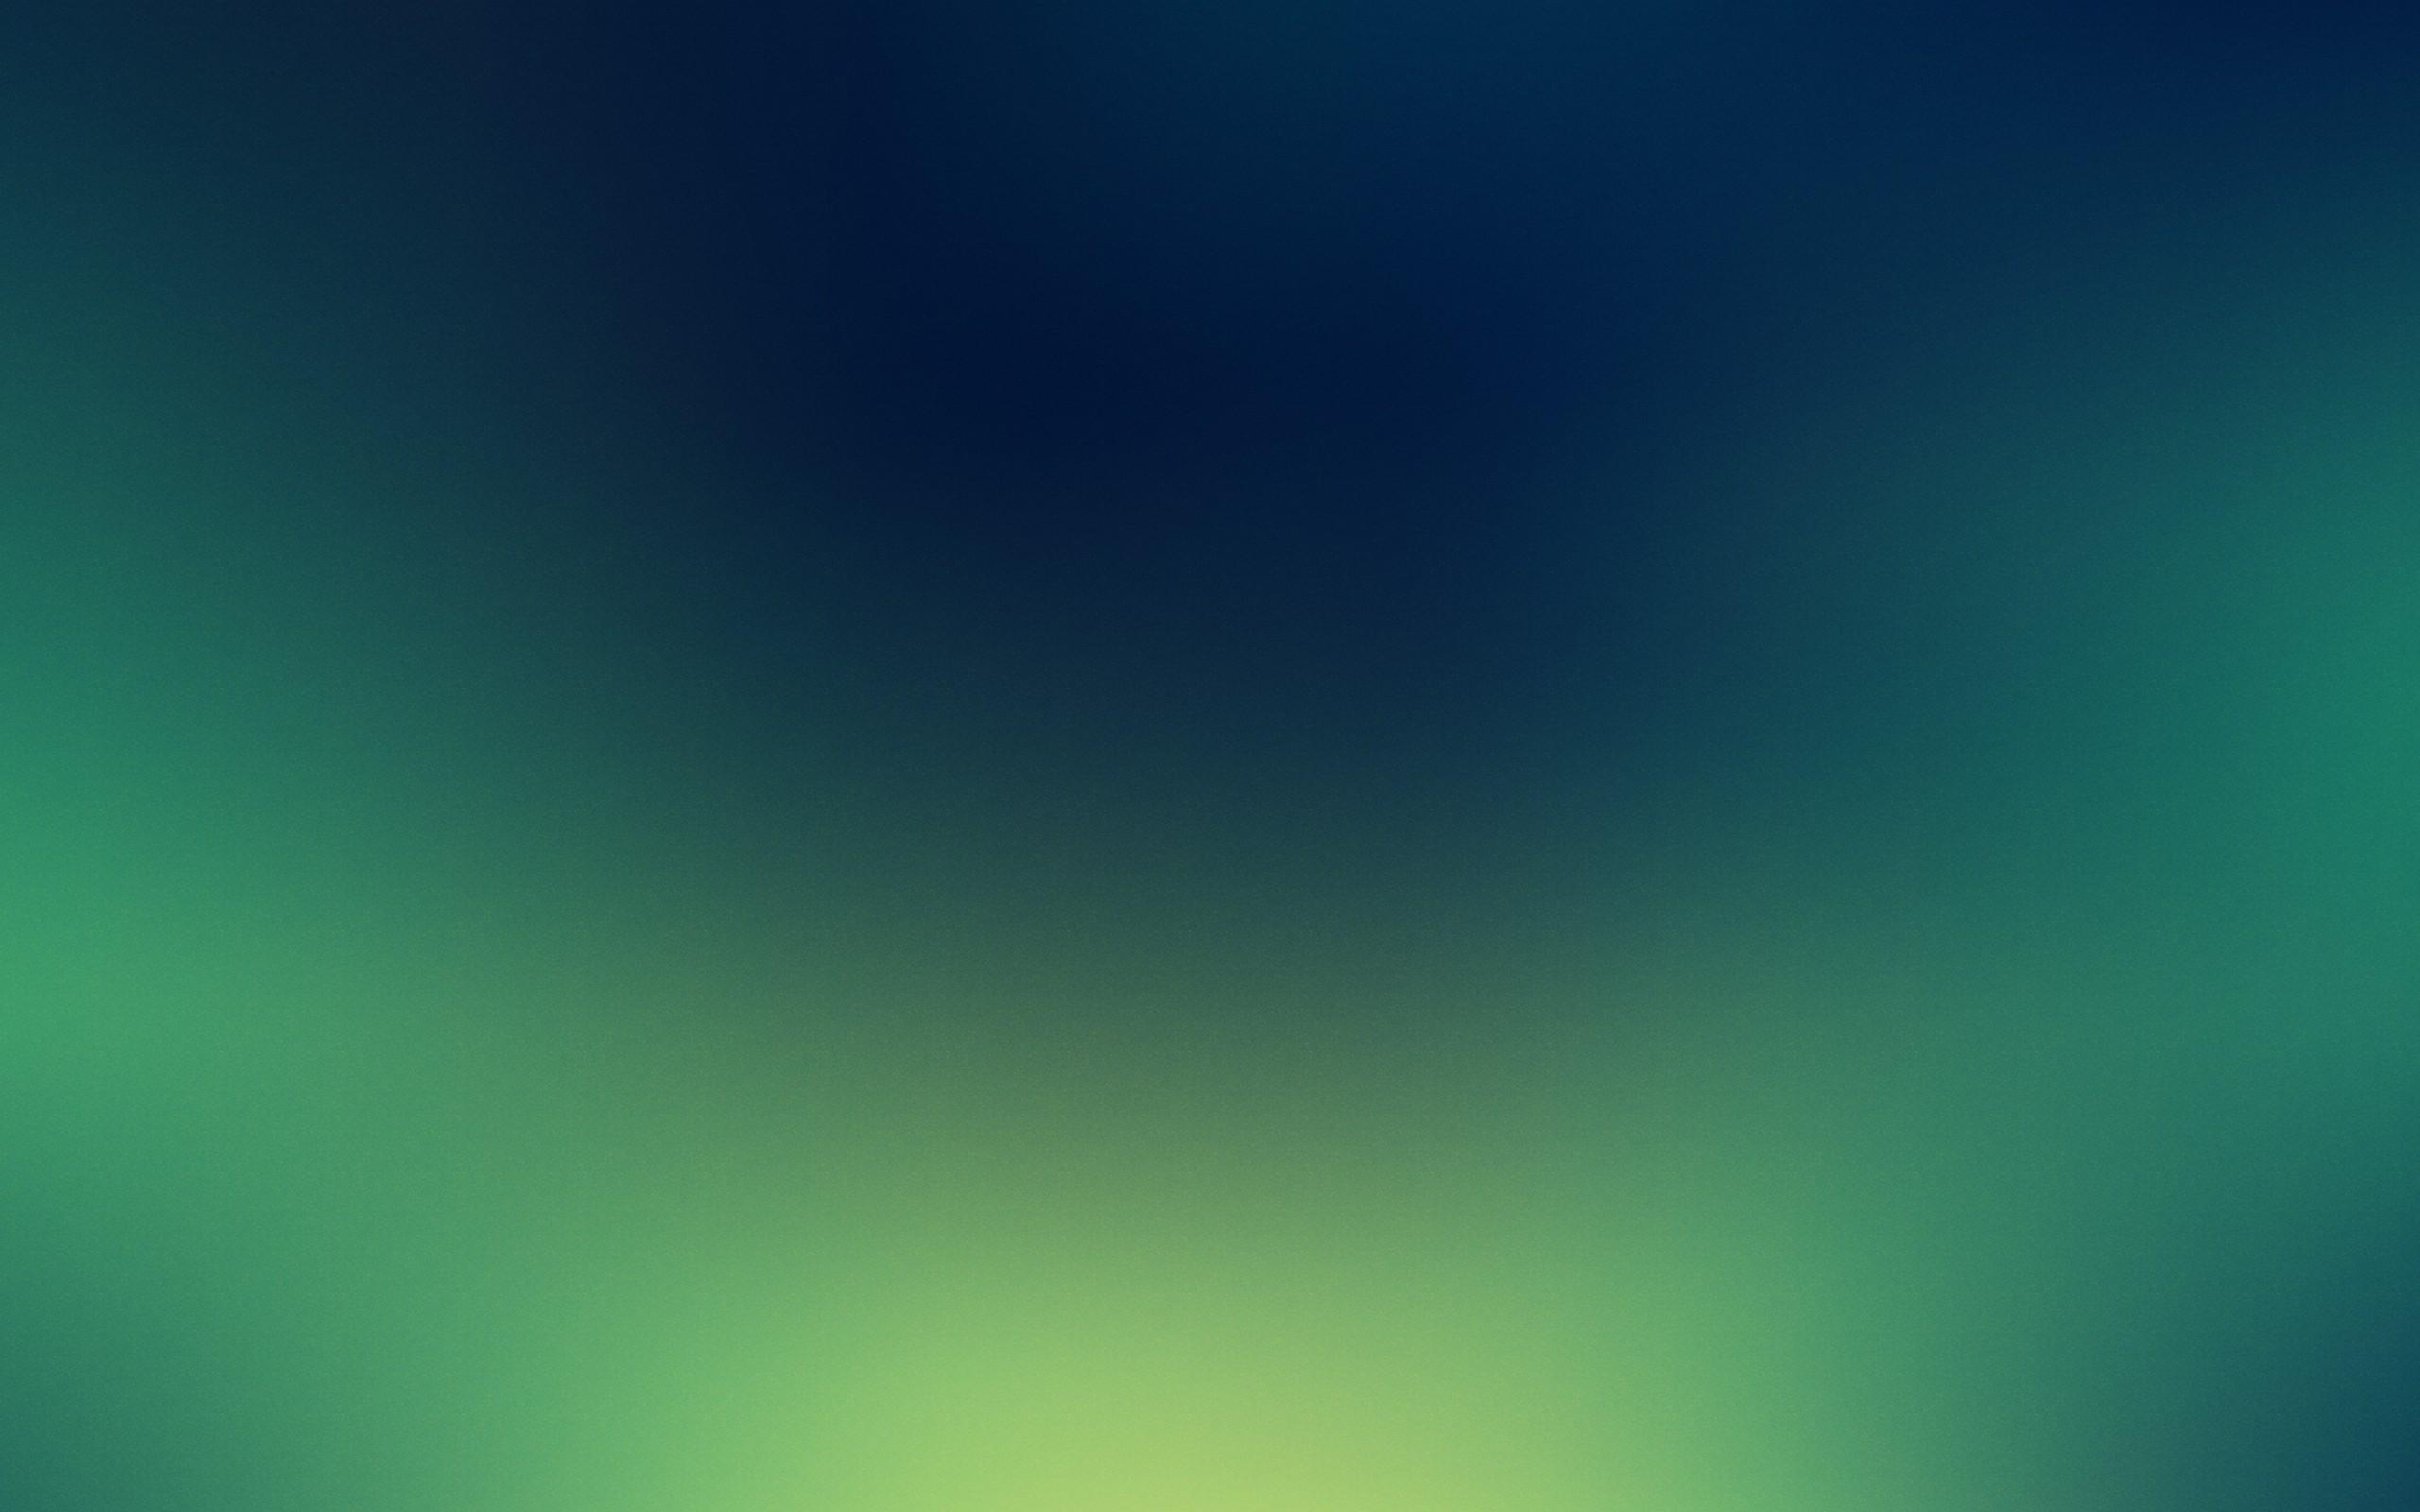 2560x1600 Cool Gradient Background